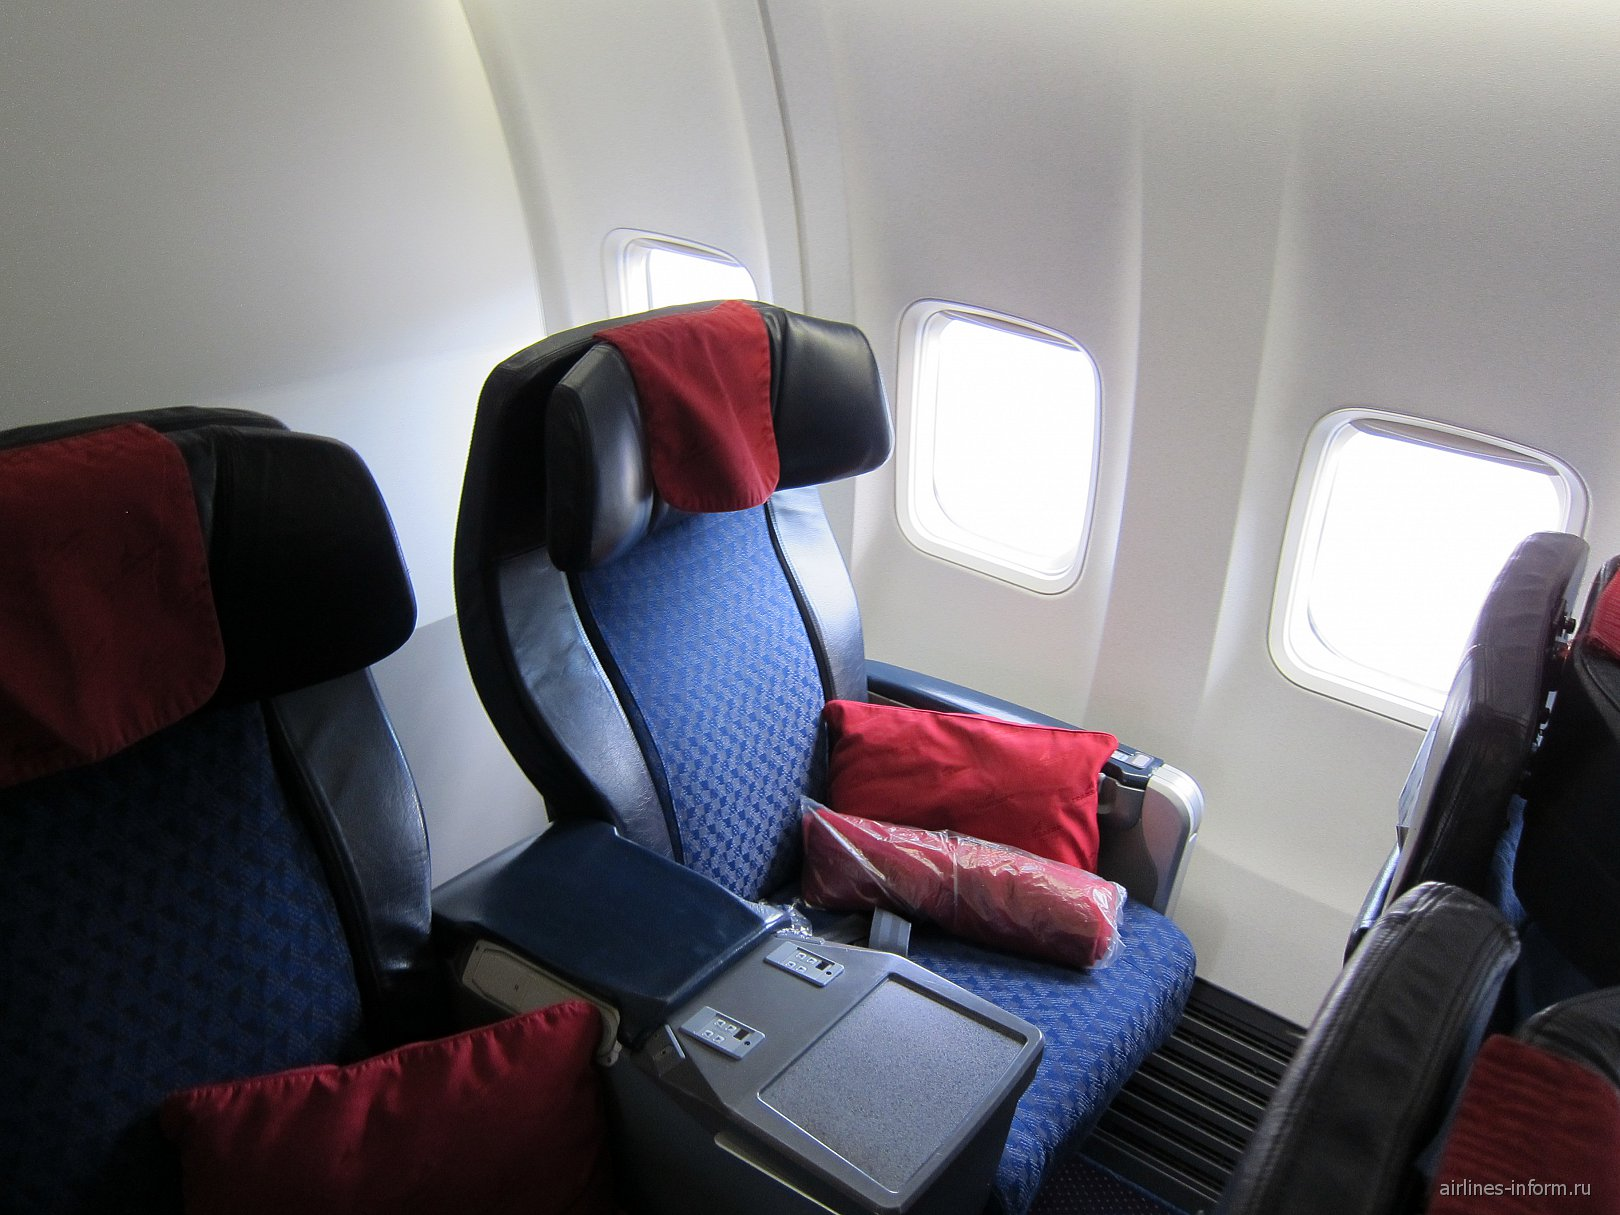 Бизнес-класс в самолете Боинг-737-800 EI-RUB авиакомпании Трансаэро